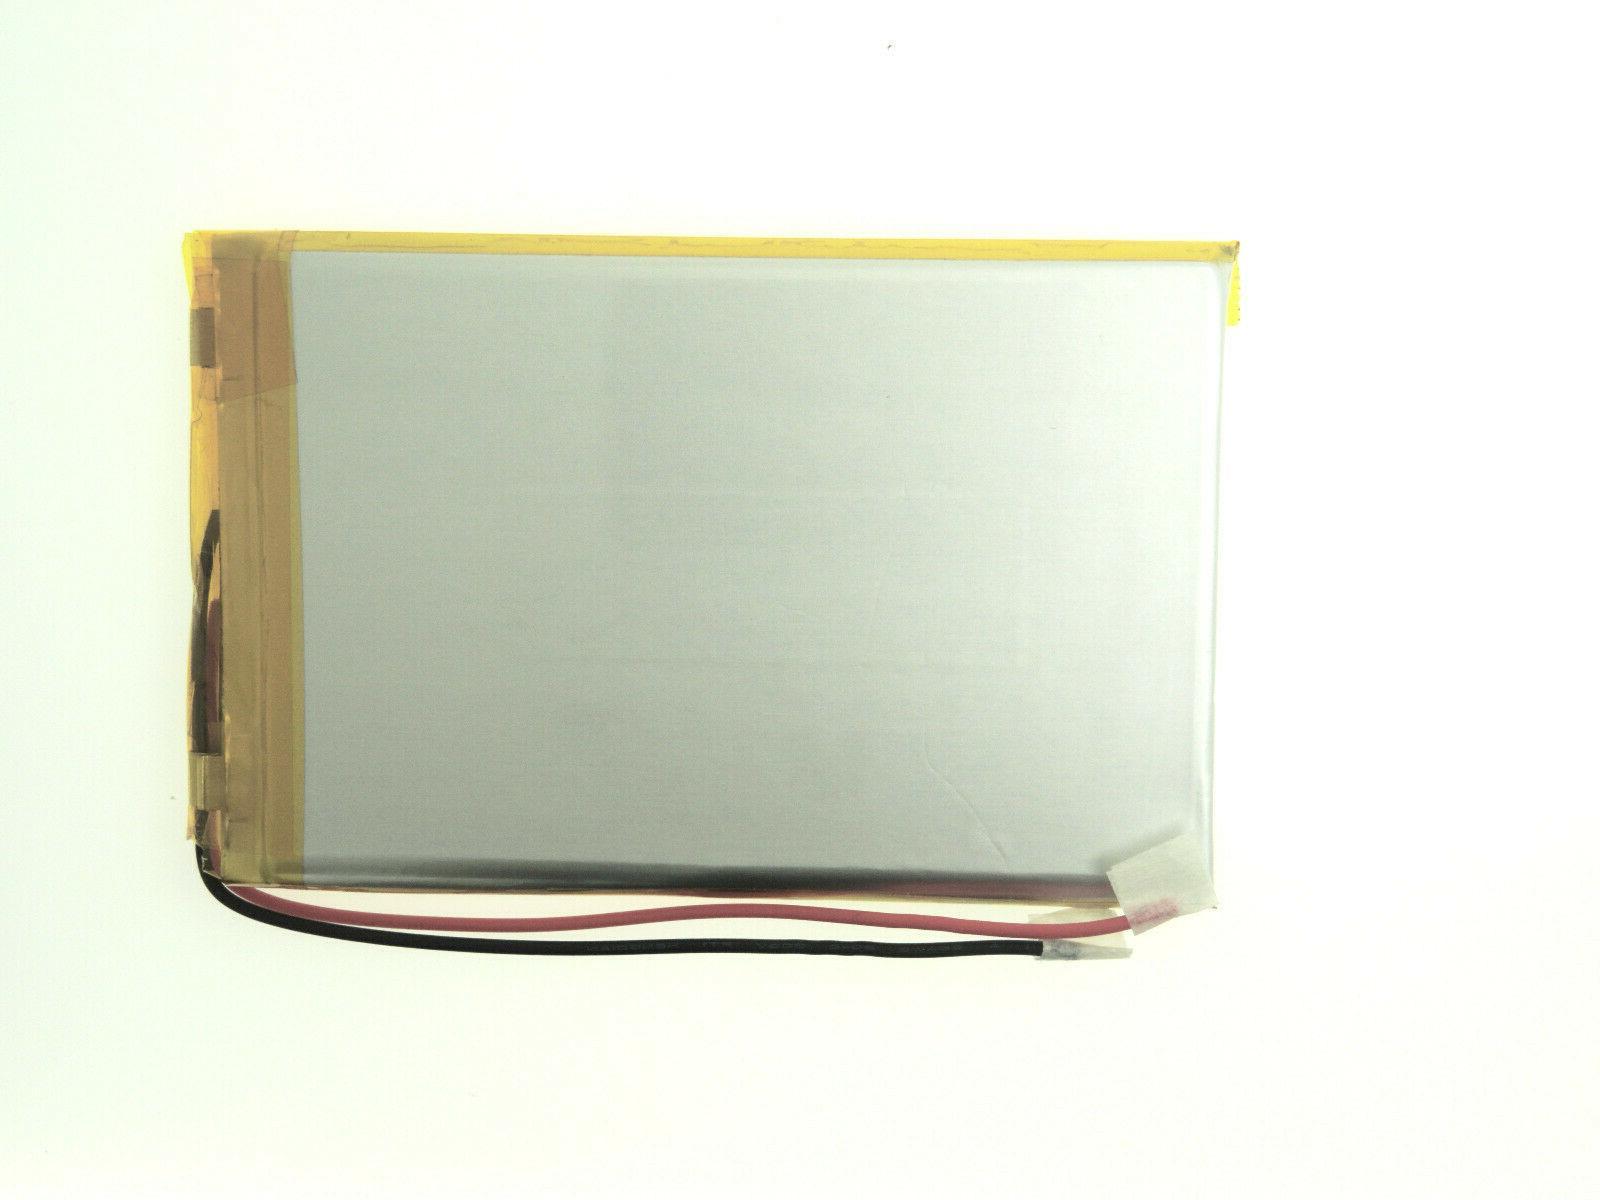 3.7V 4000mAh 606090 Lithium Battery